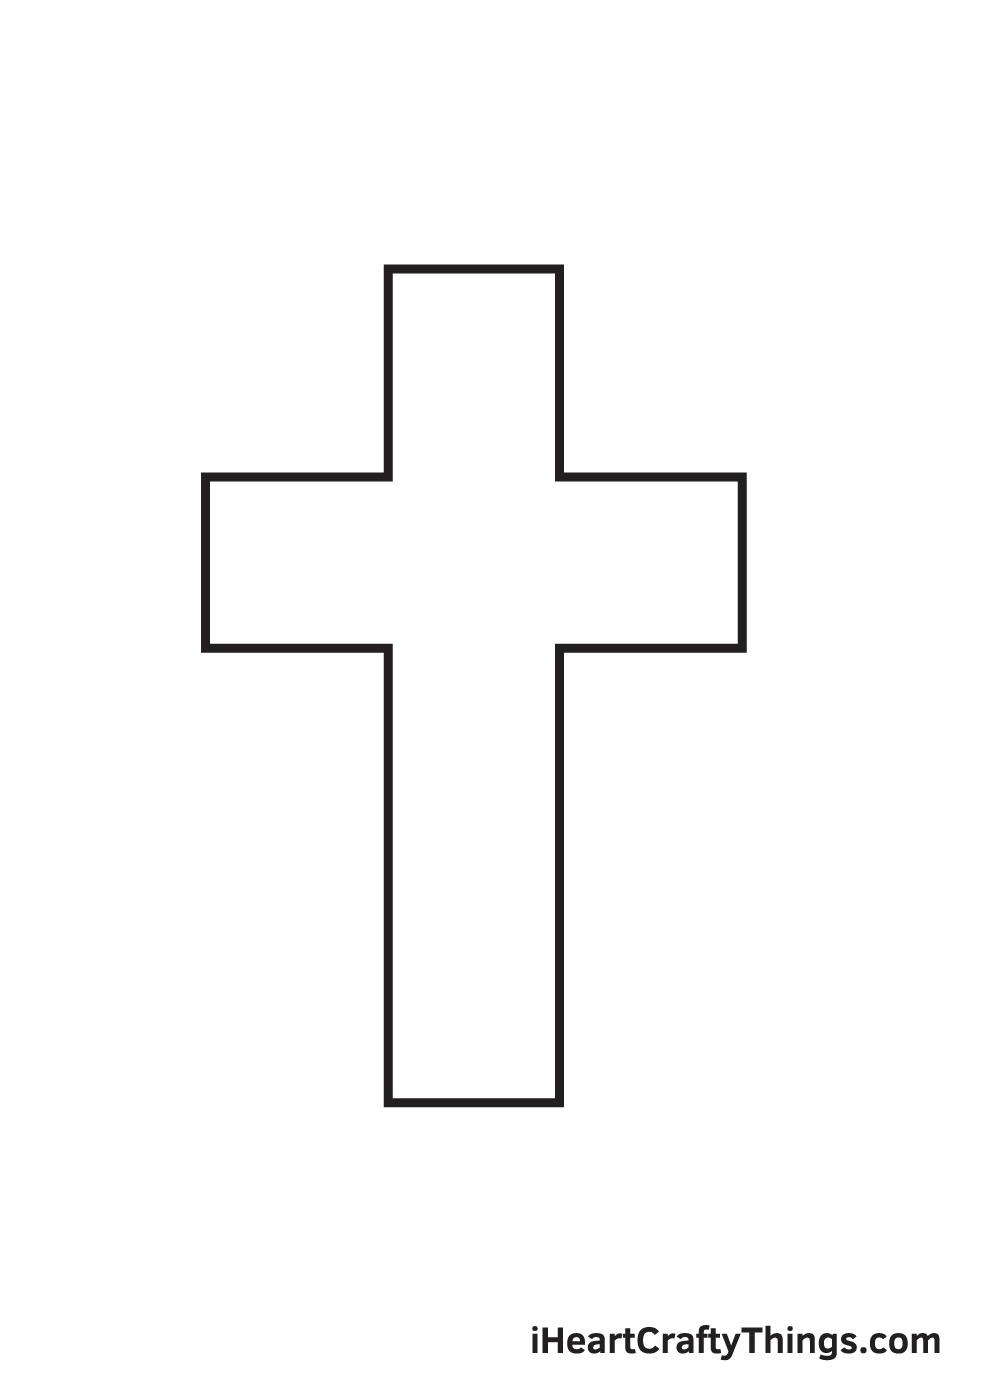 cross drawing - step 6